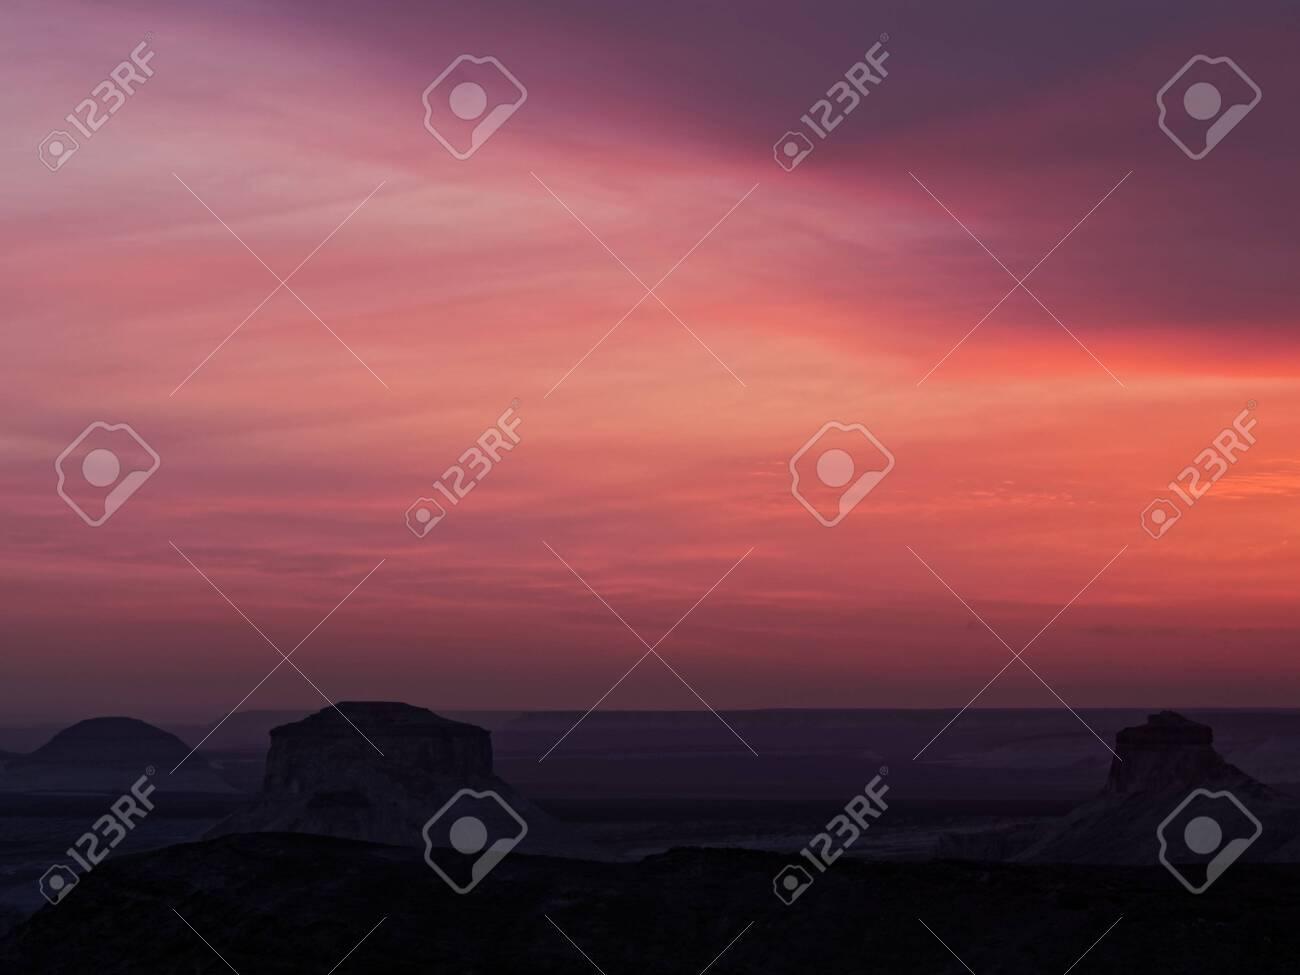 The tract Basira at sunset. Kazakhstan 2019. Expedition site Tourist.ru. - 131608106